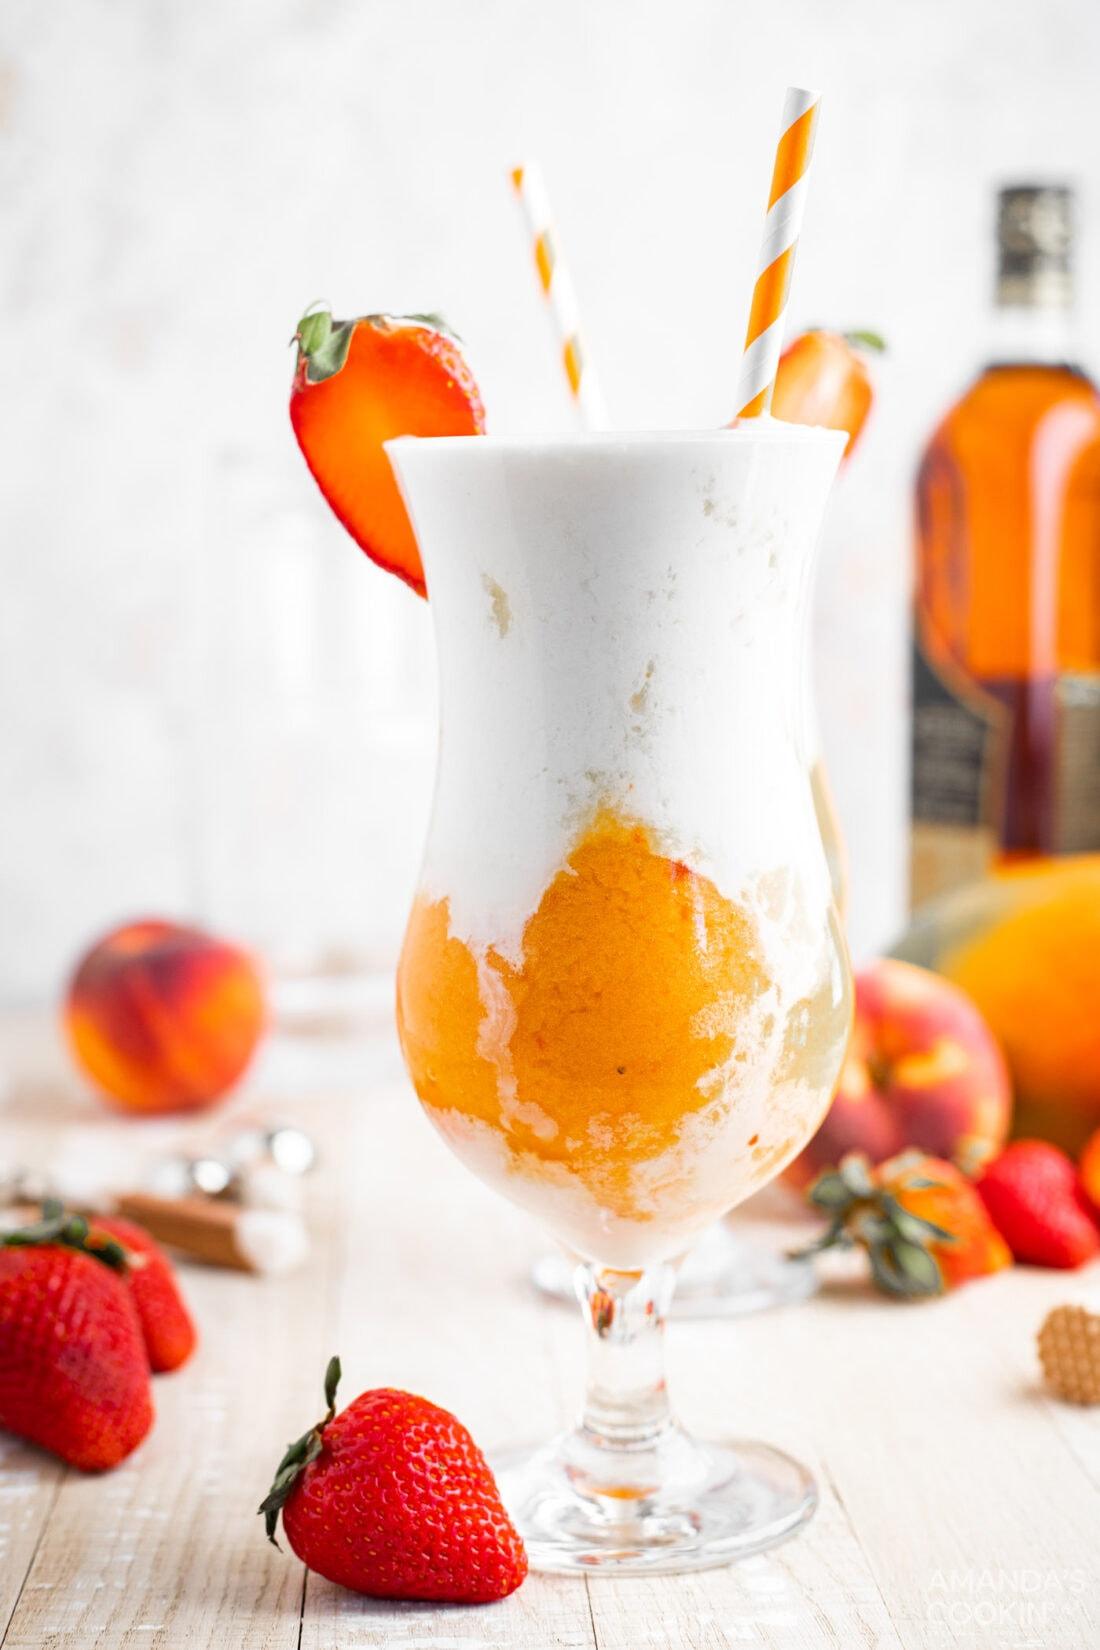 Tropical Rum Slush with straws